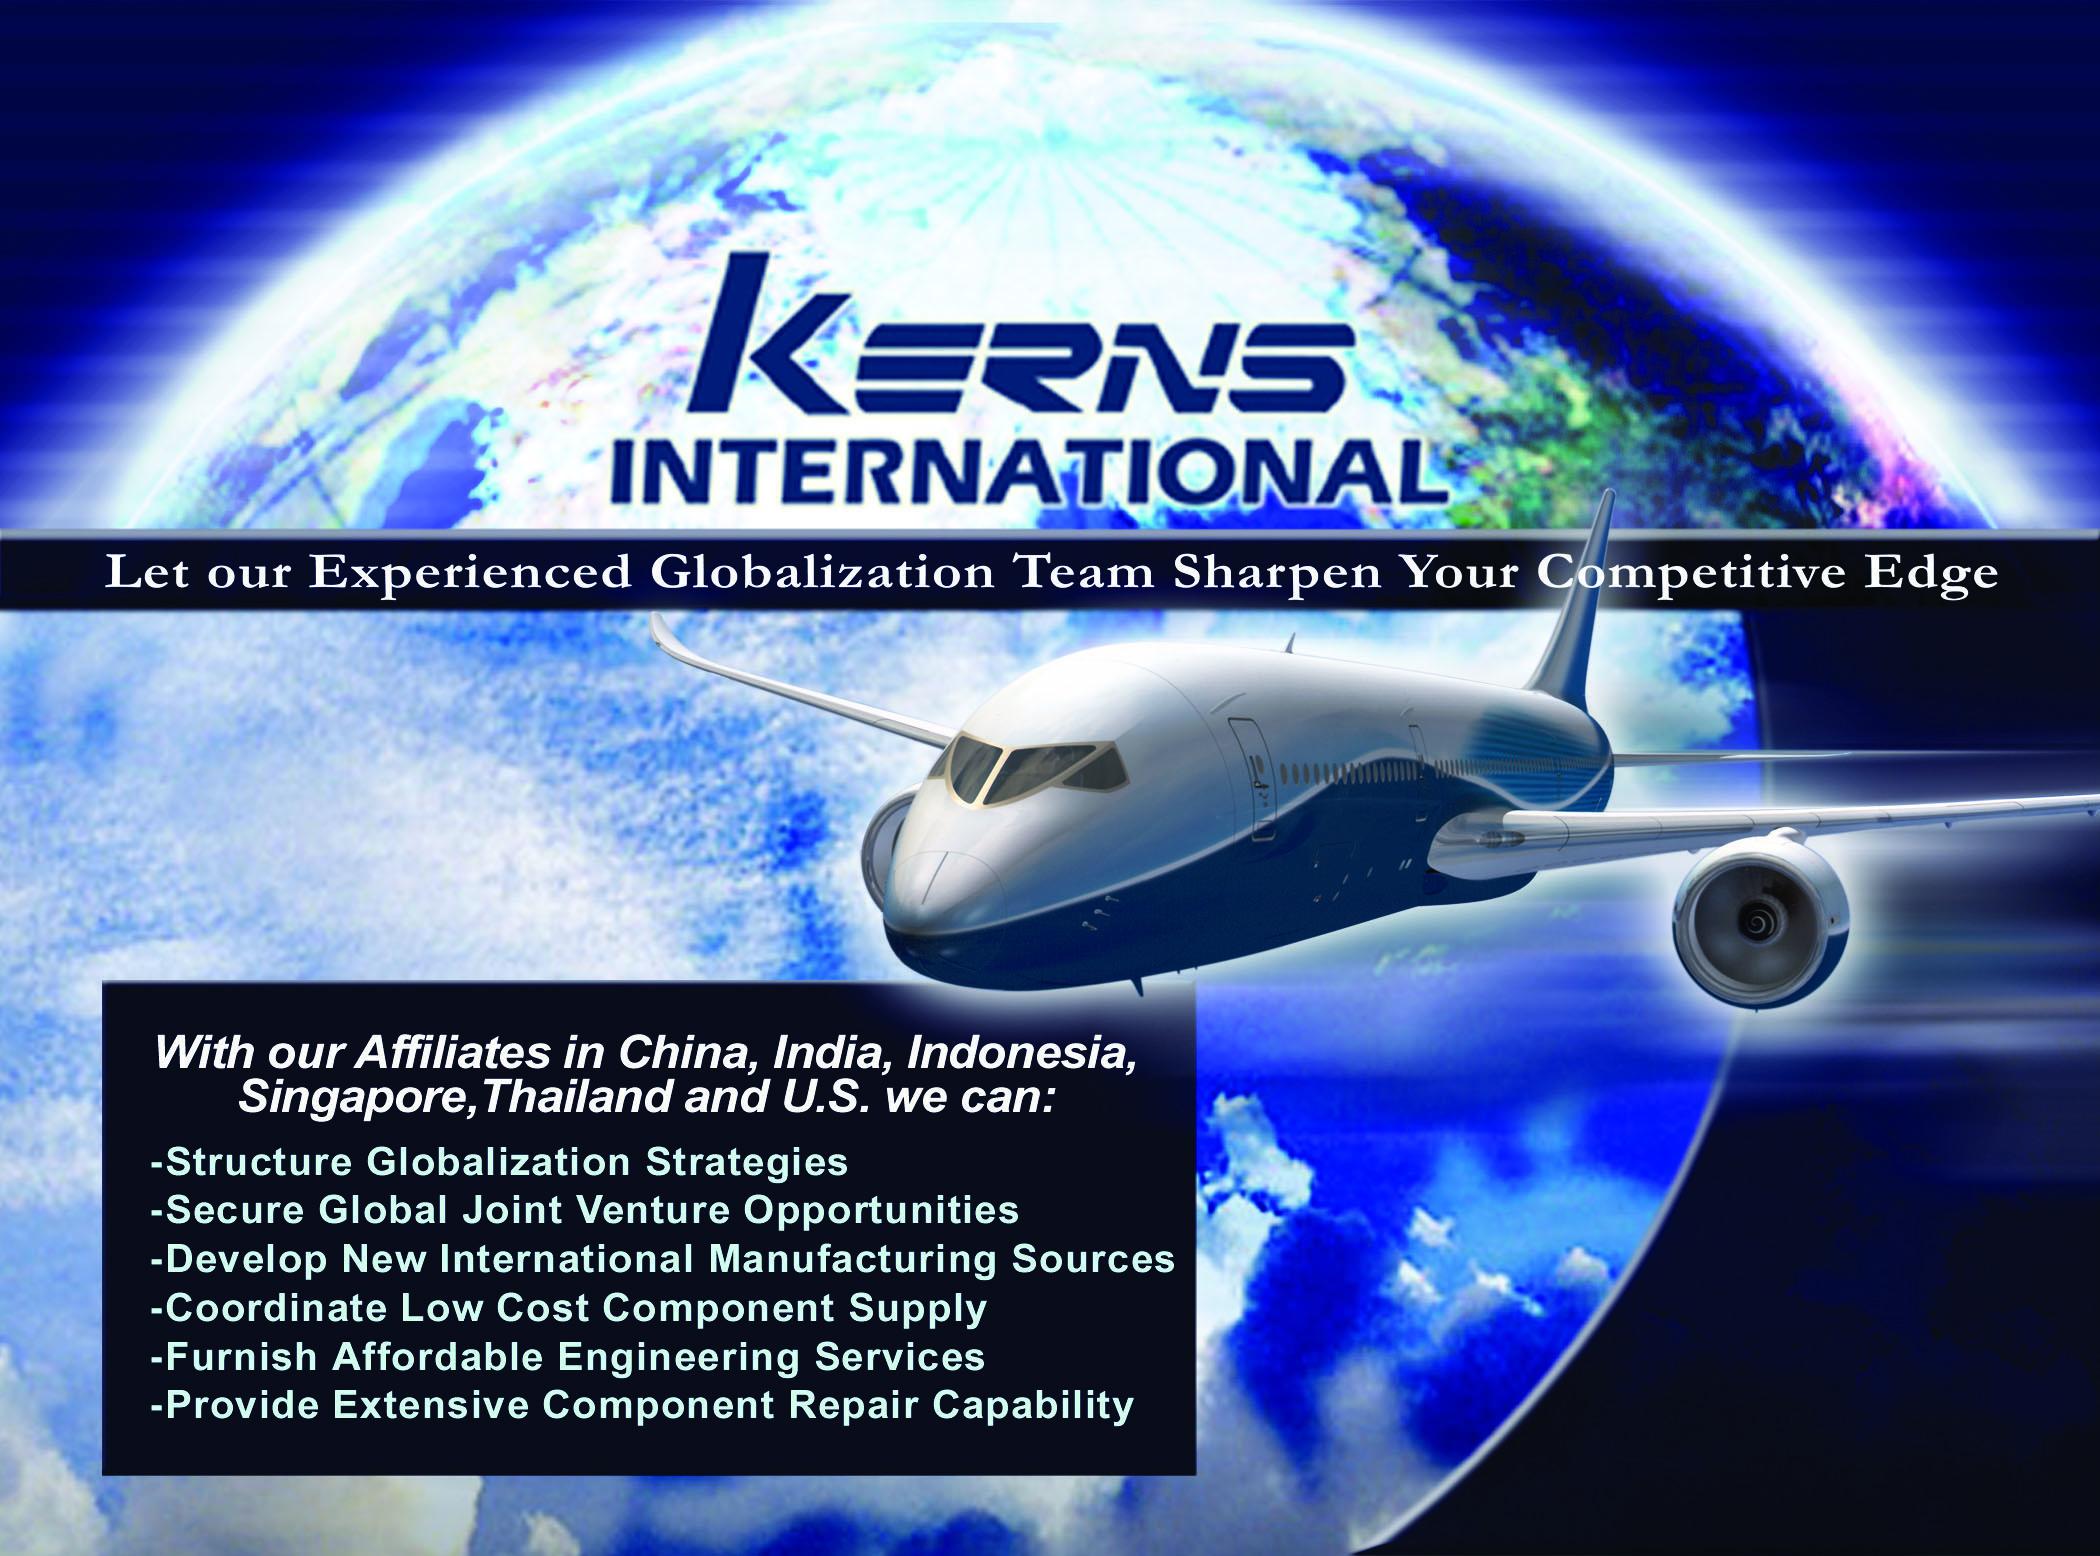 KernsInternational_AD.jpg